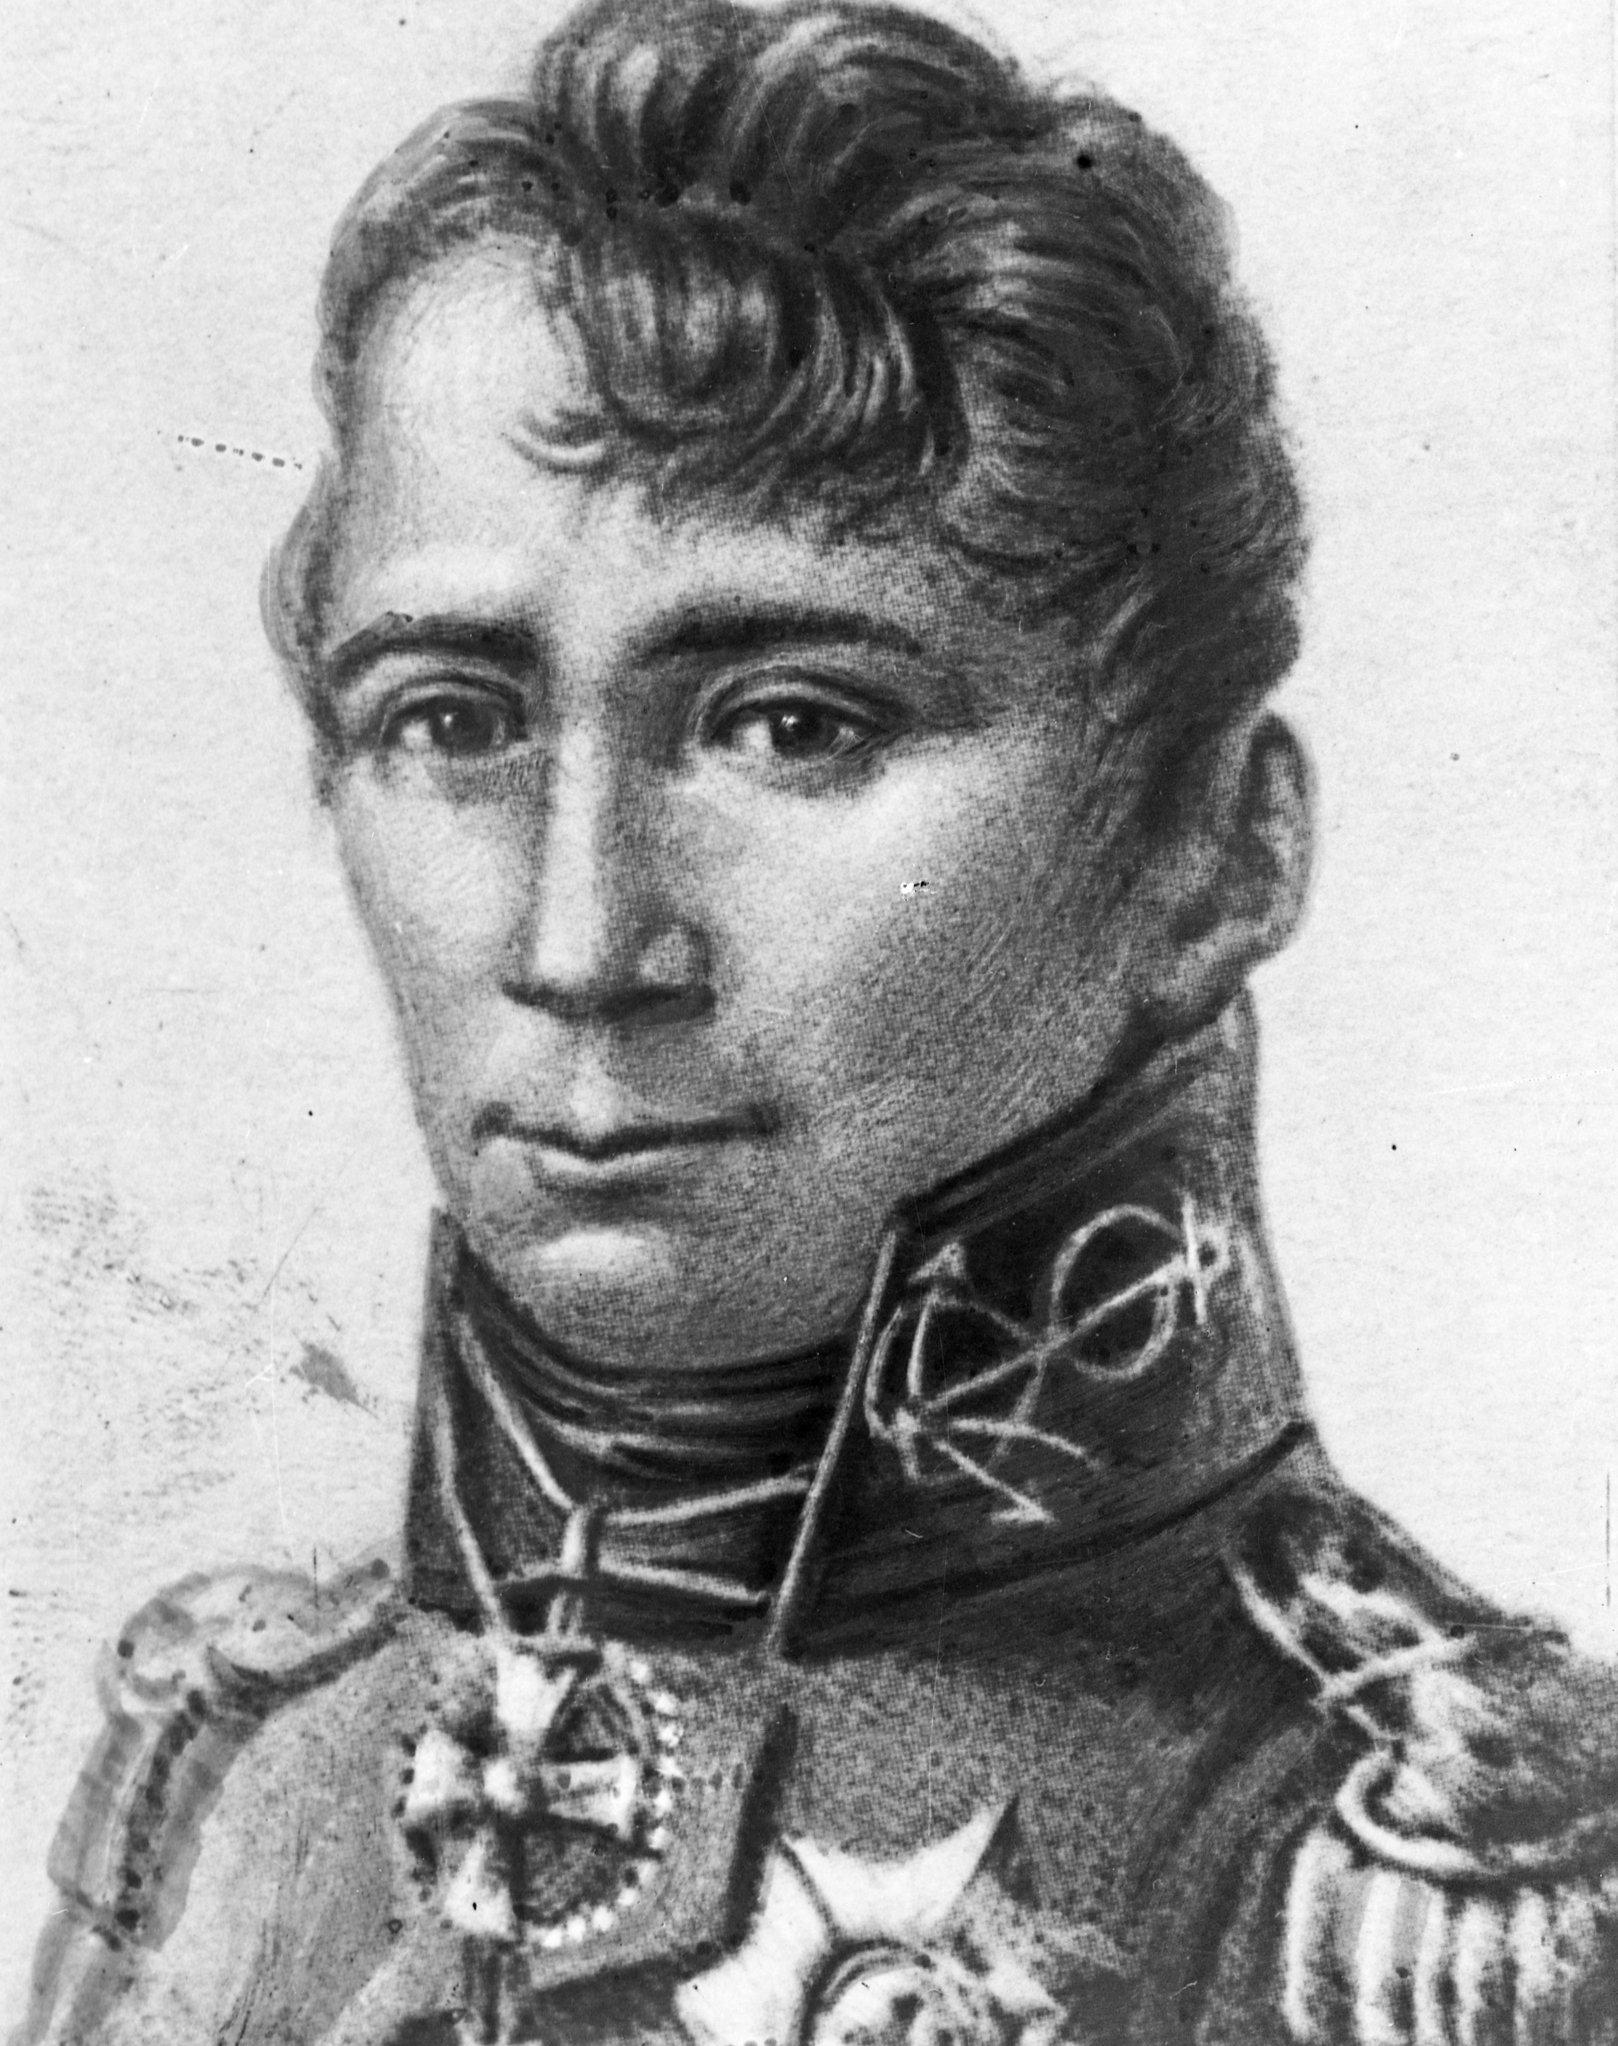 Адмирал Иван Федорович Крузенштерн